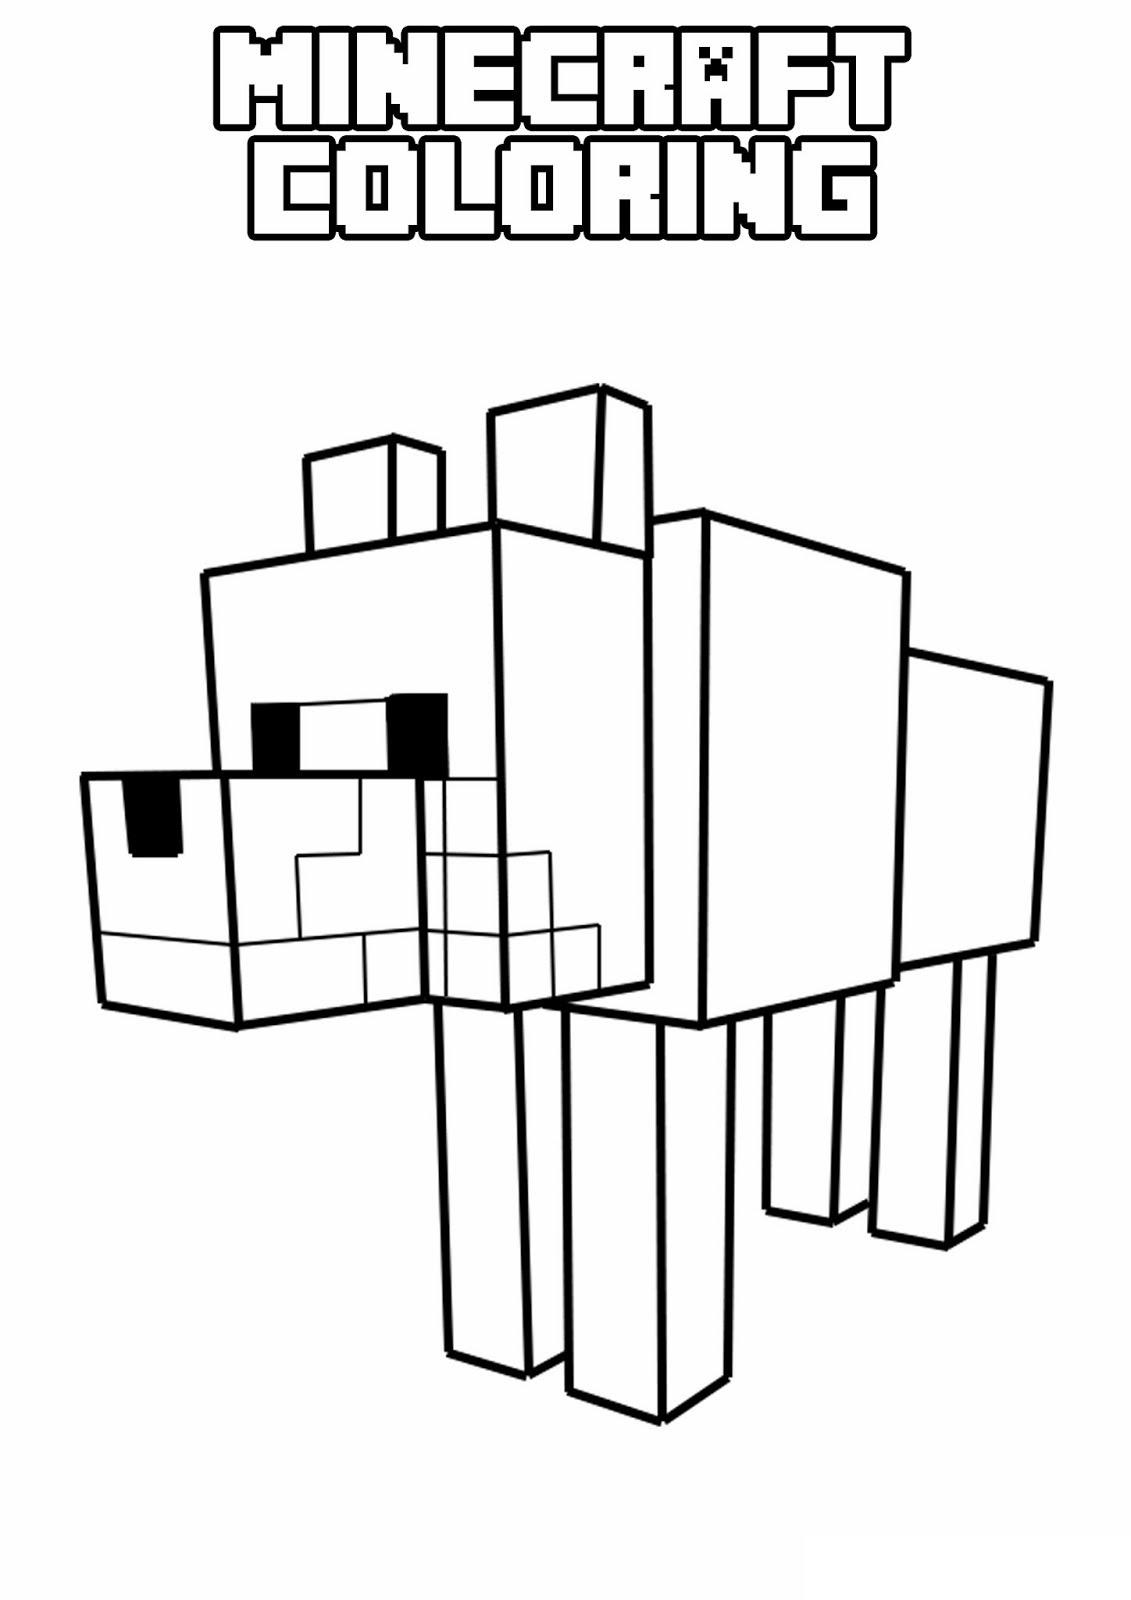 Kleurplaten Minecraft Steve.Charmante Minecraft Kleurplaten Printen Krijg Duizenden